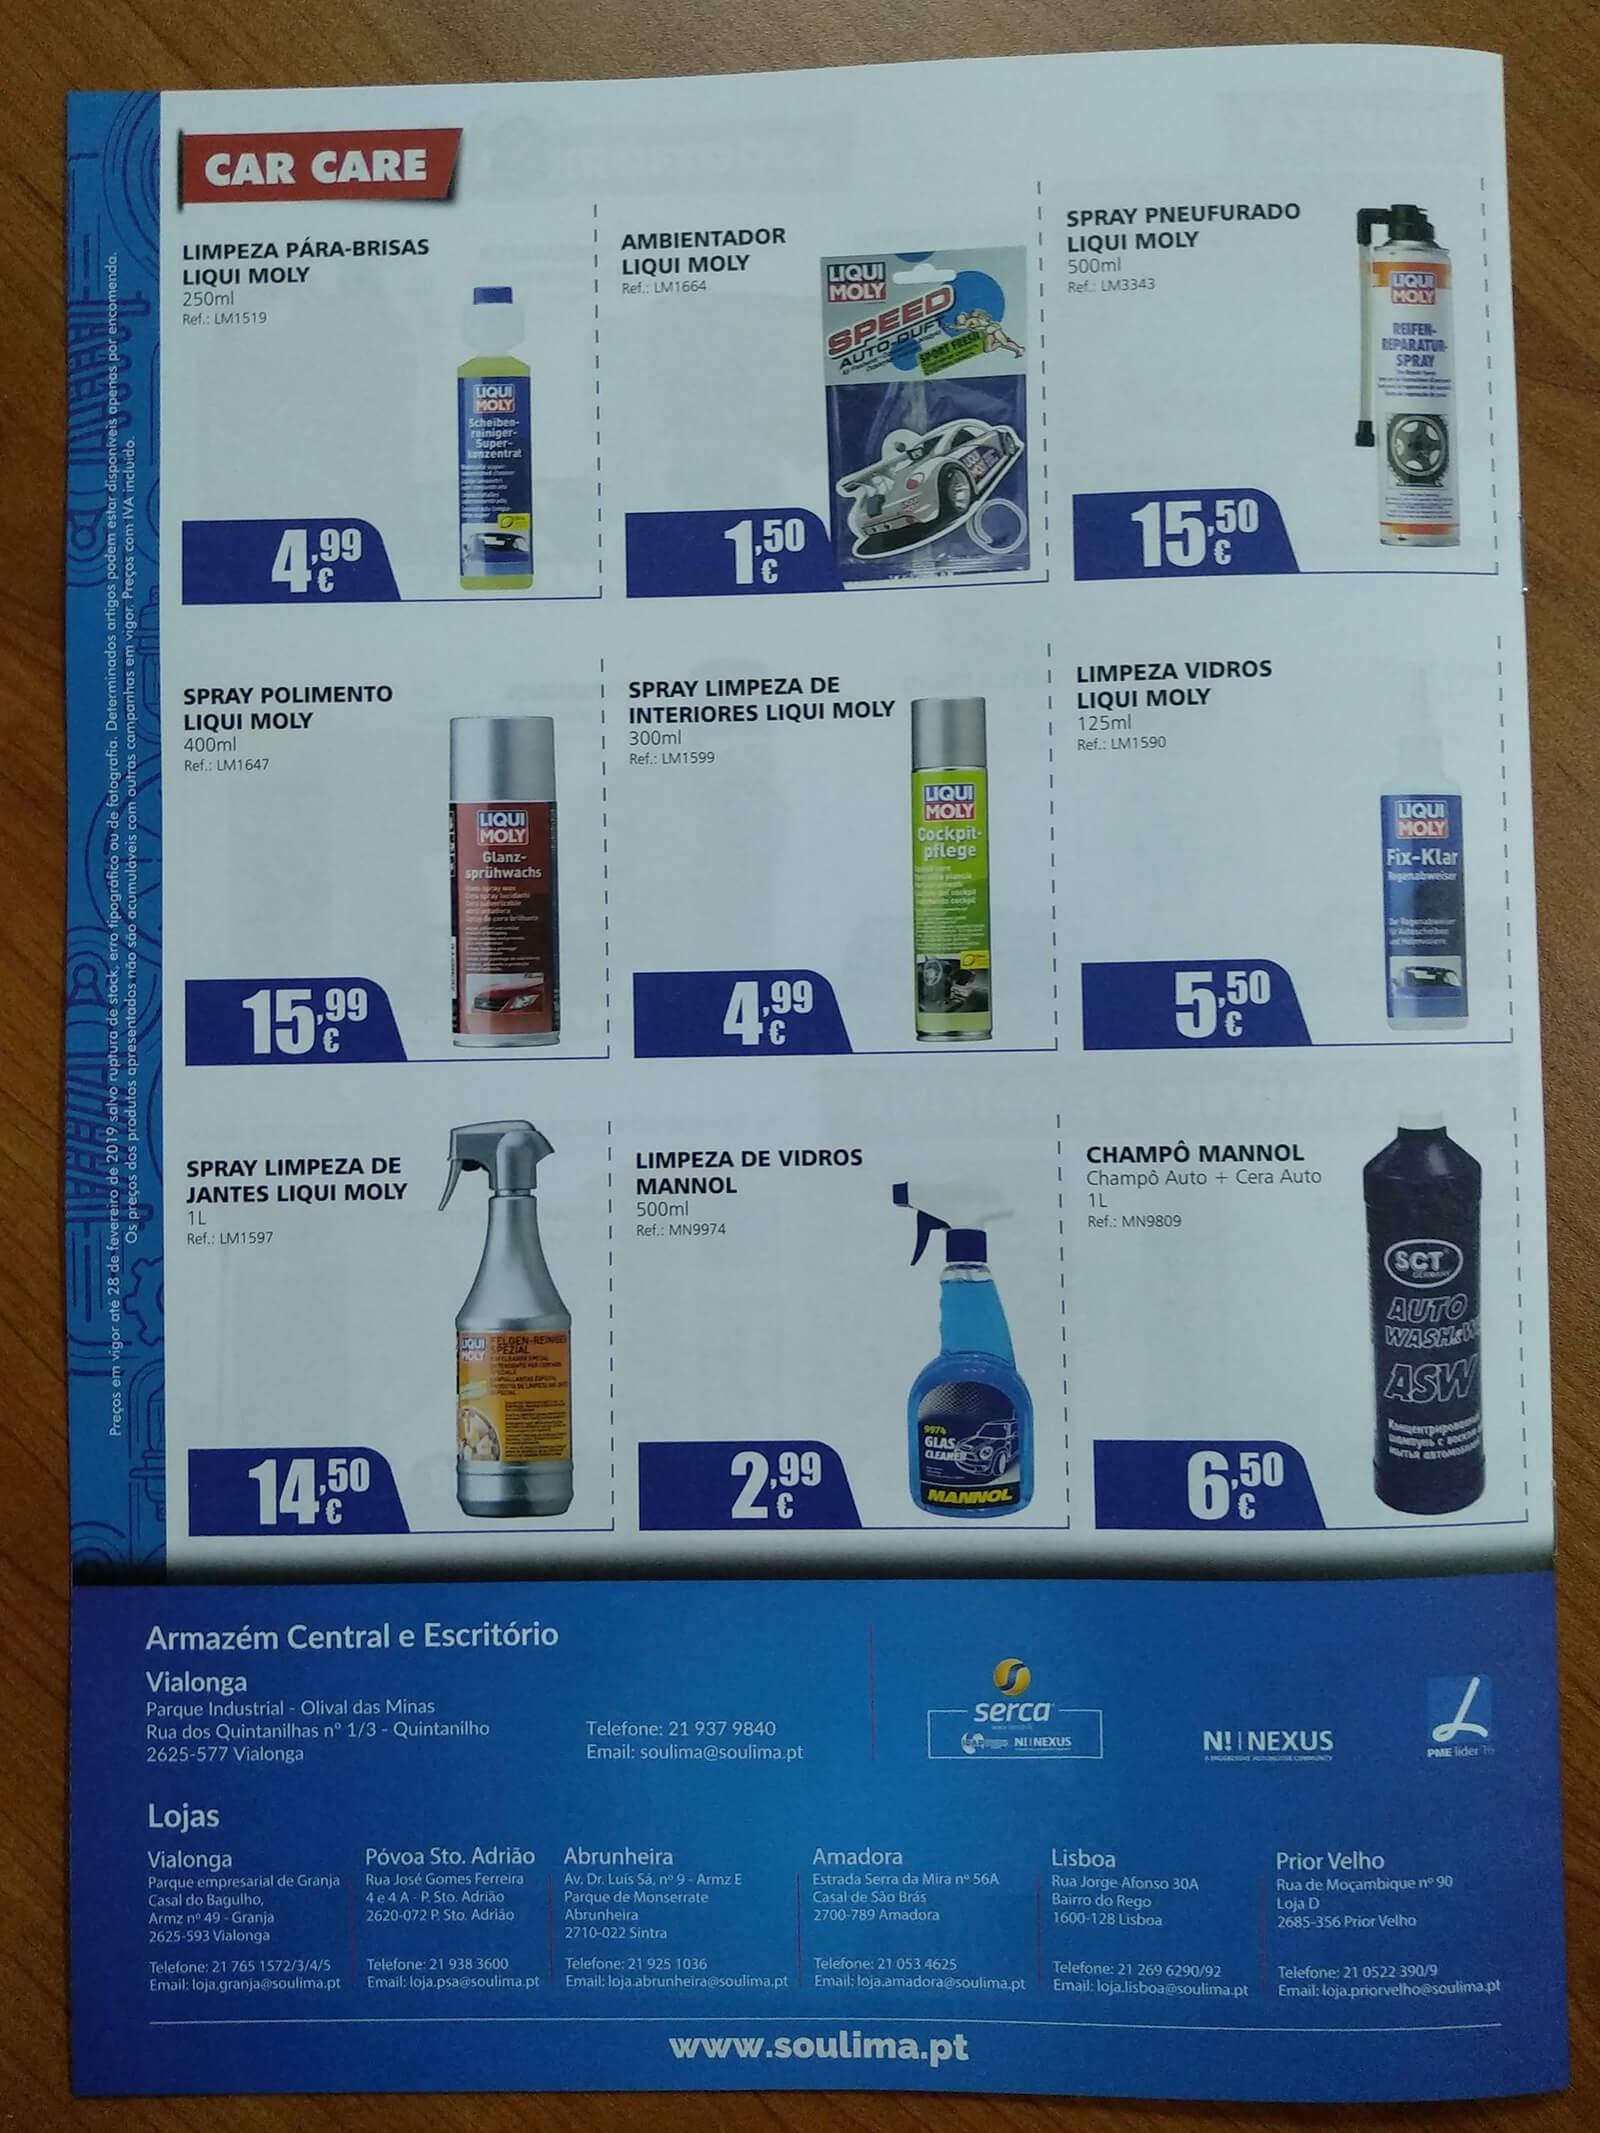 Soulima - Comércio de Peças - Printed Brochure Soulima - Back Cover | Luis Serra Freelancer